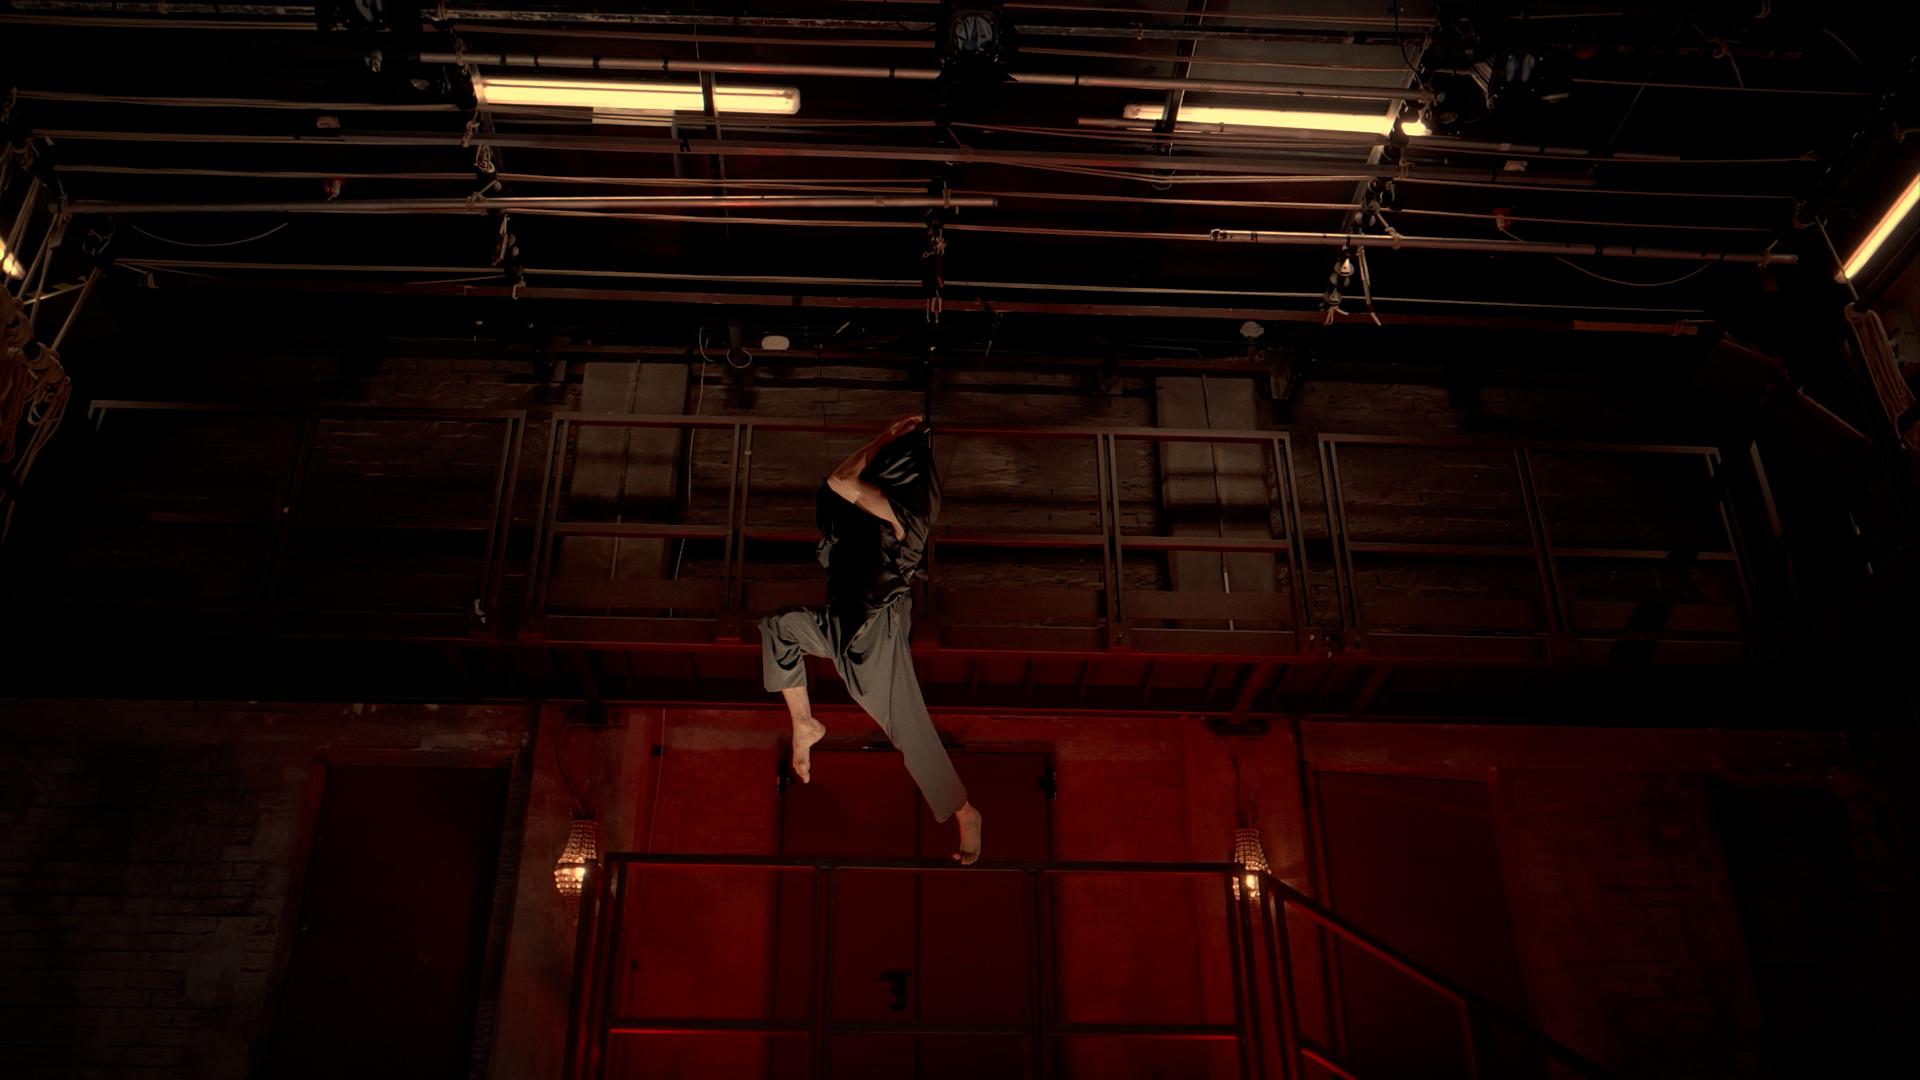 Collezione di Elena Gregori_Teatro Franco Parenti_1_performer Gian Mattia Baldan